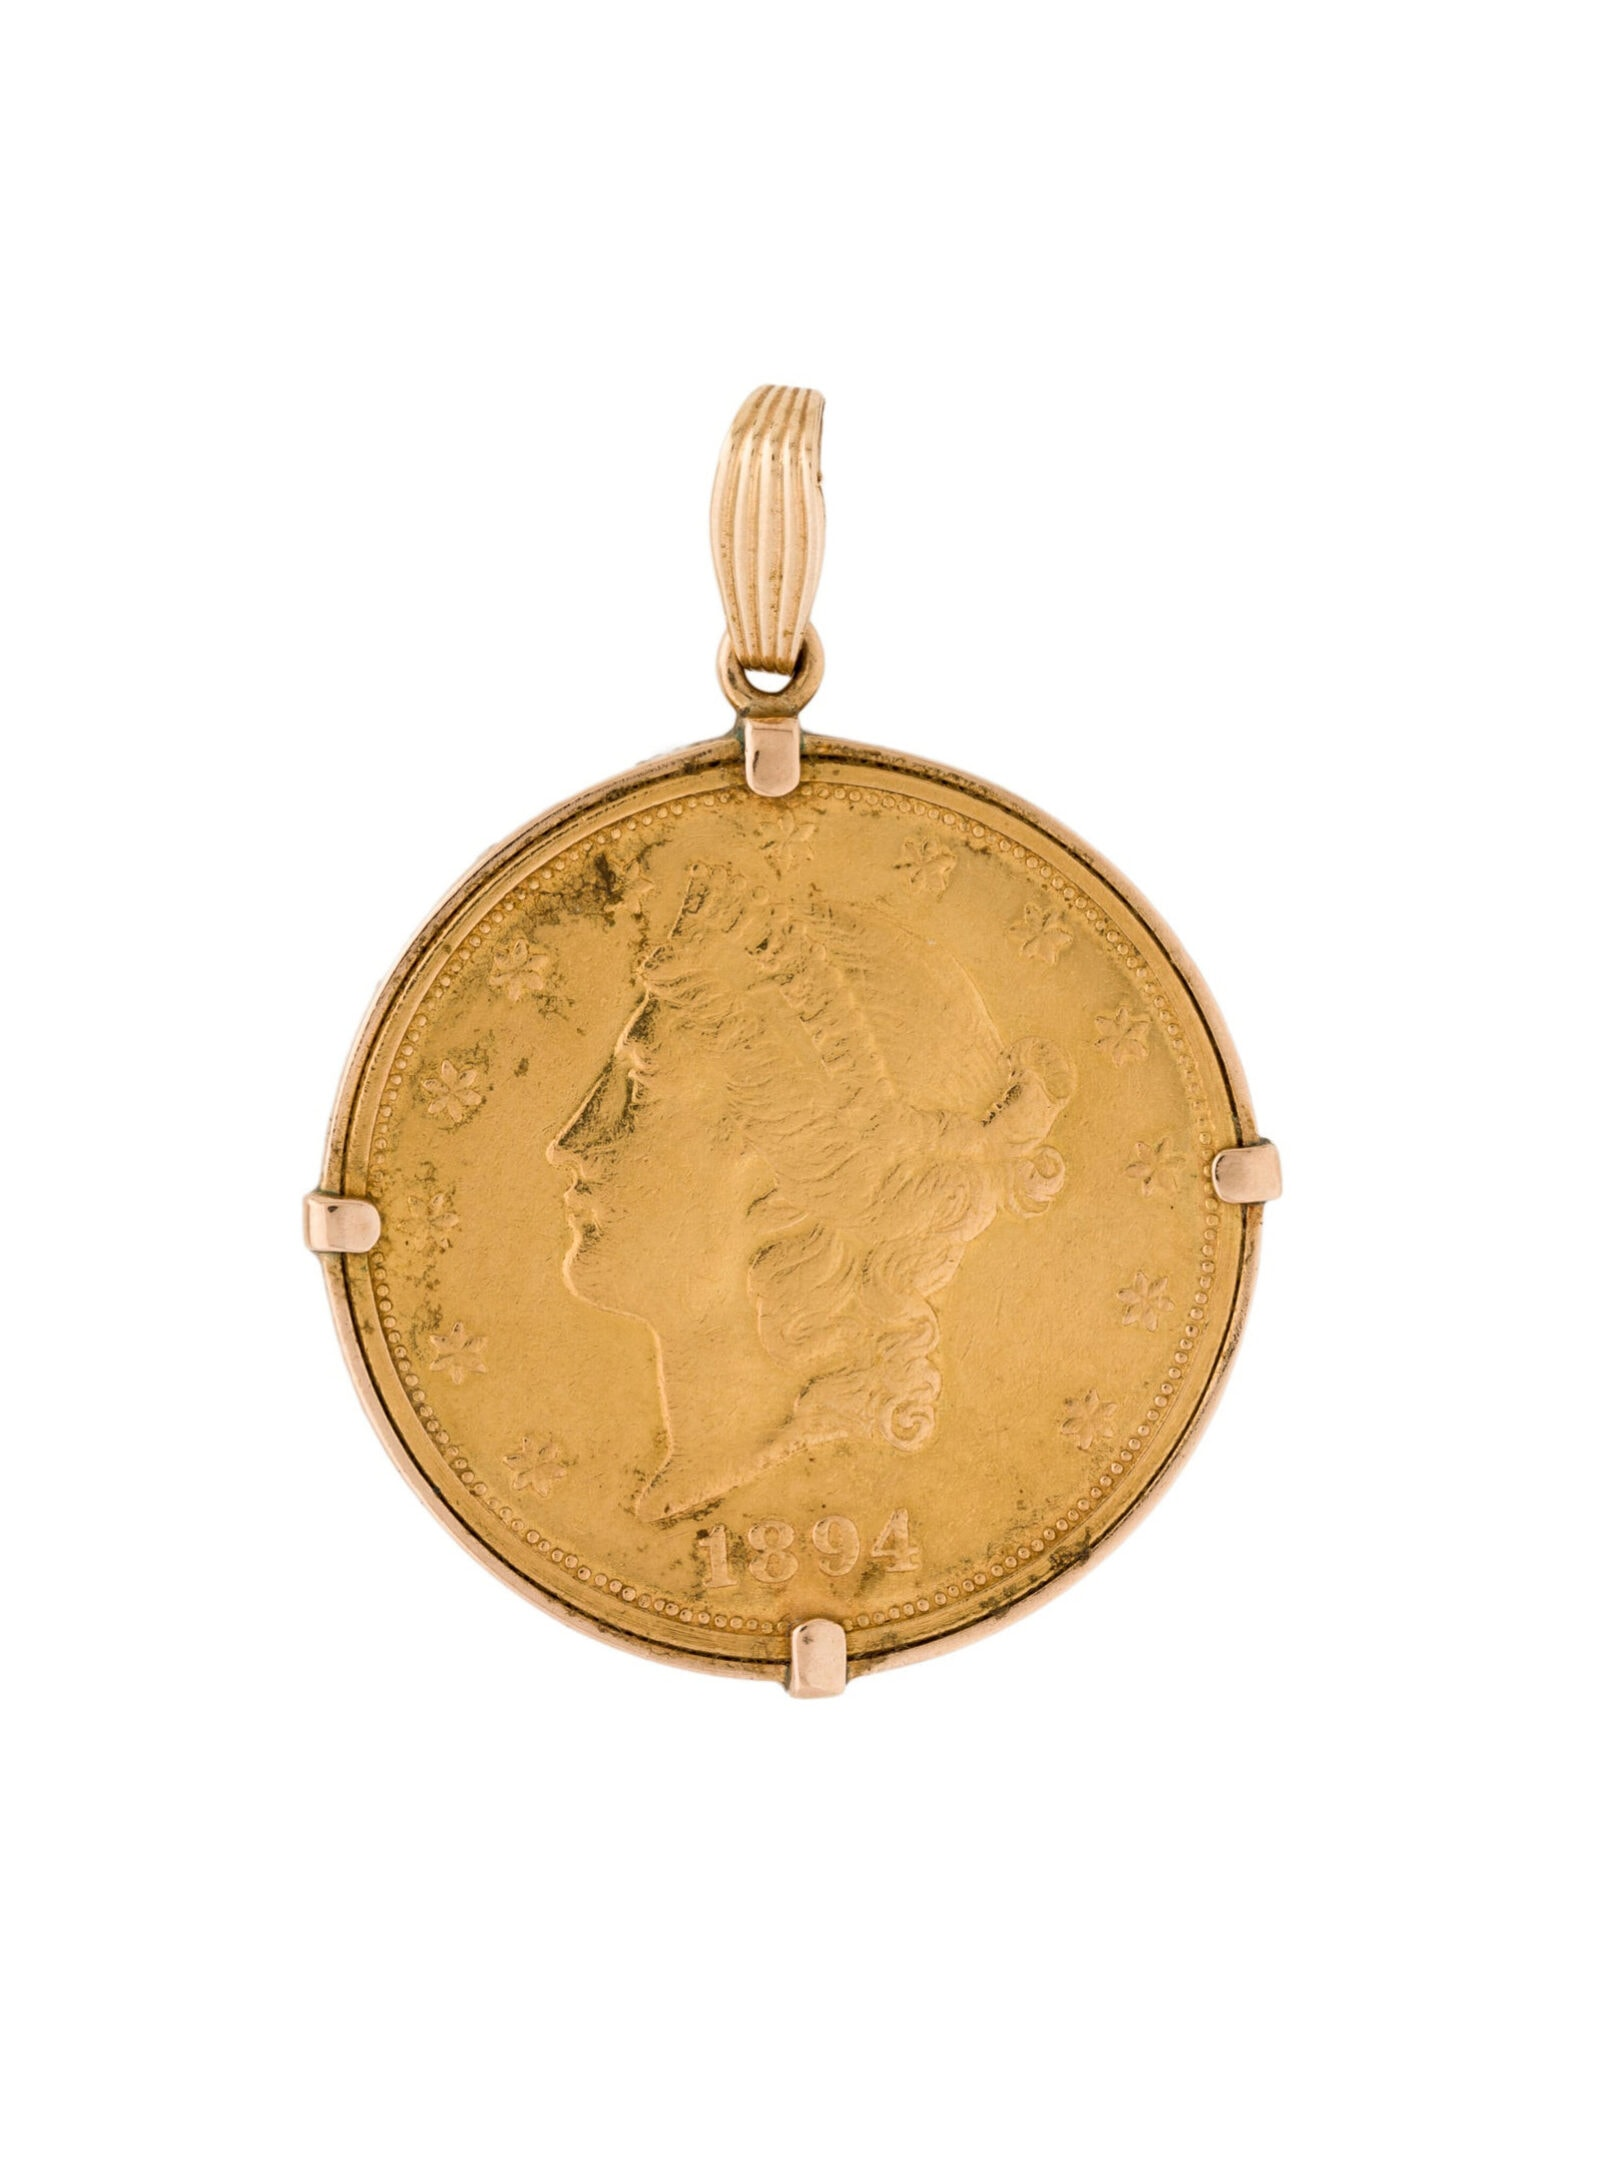 PENDANT Coin Pendant